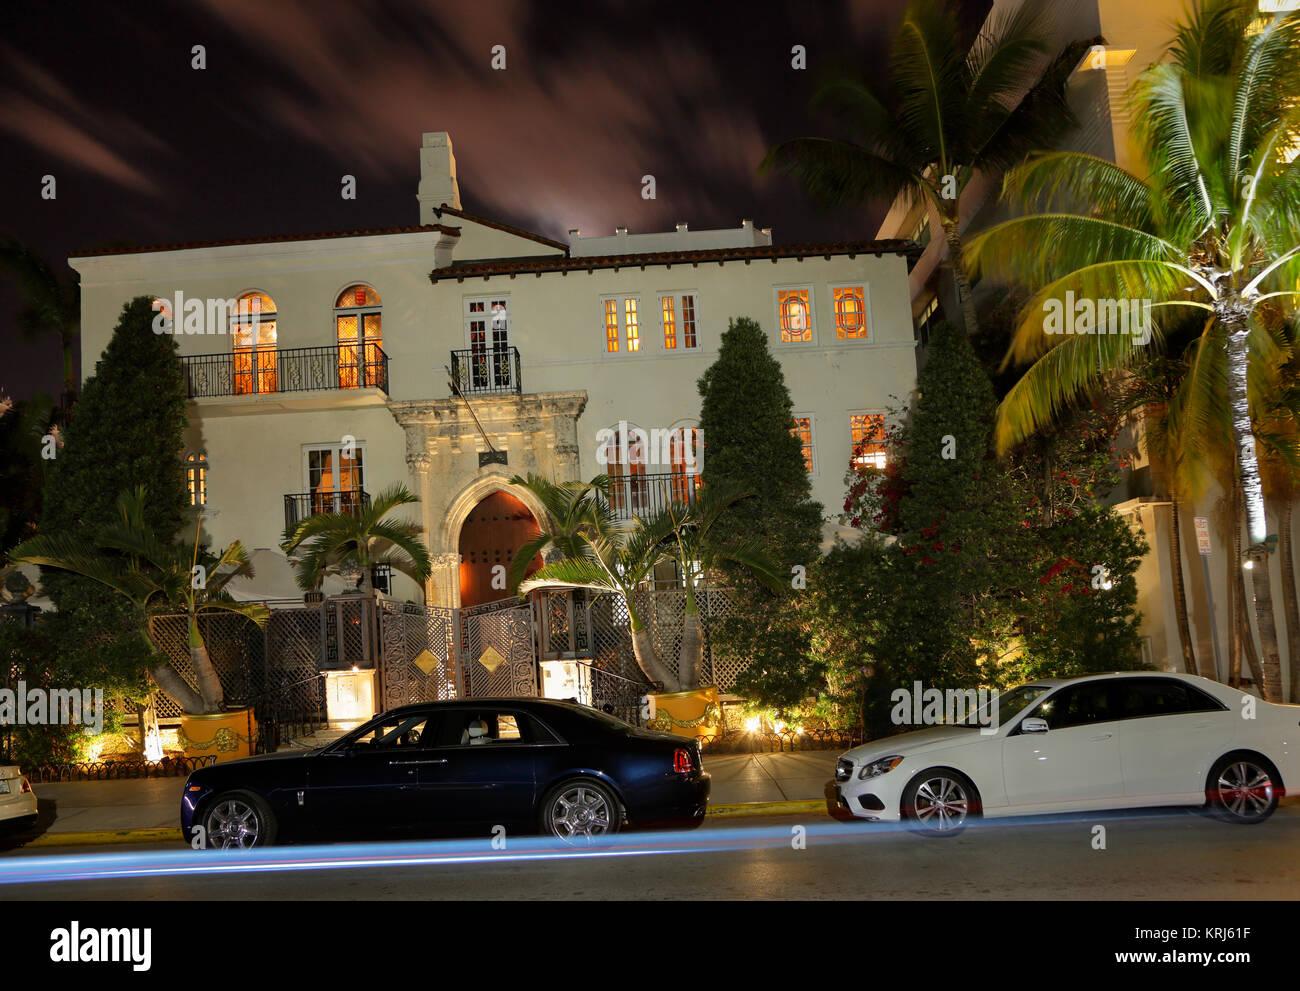 Casa Casuarina, former home of fashion designer Gianni Versace, Miami Beach, Florida, USA - Stock Image